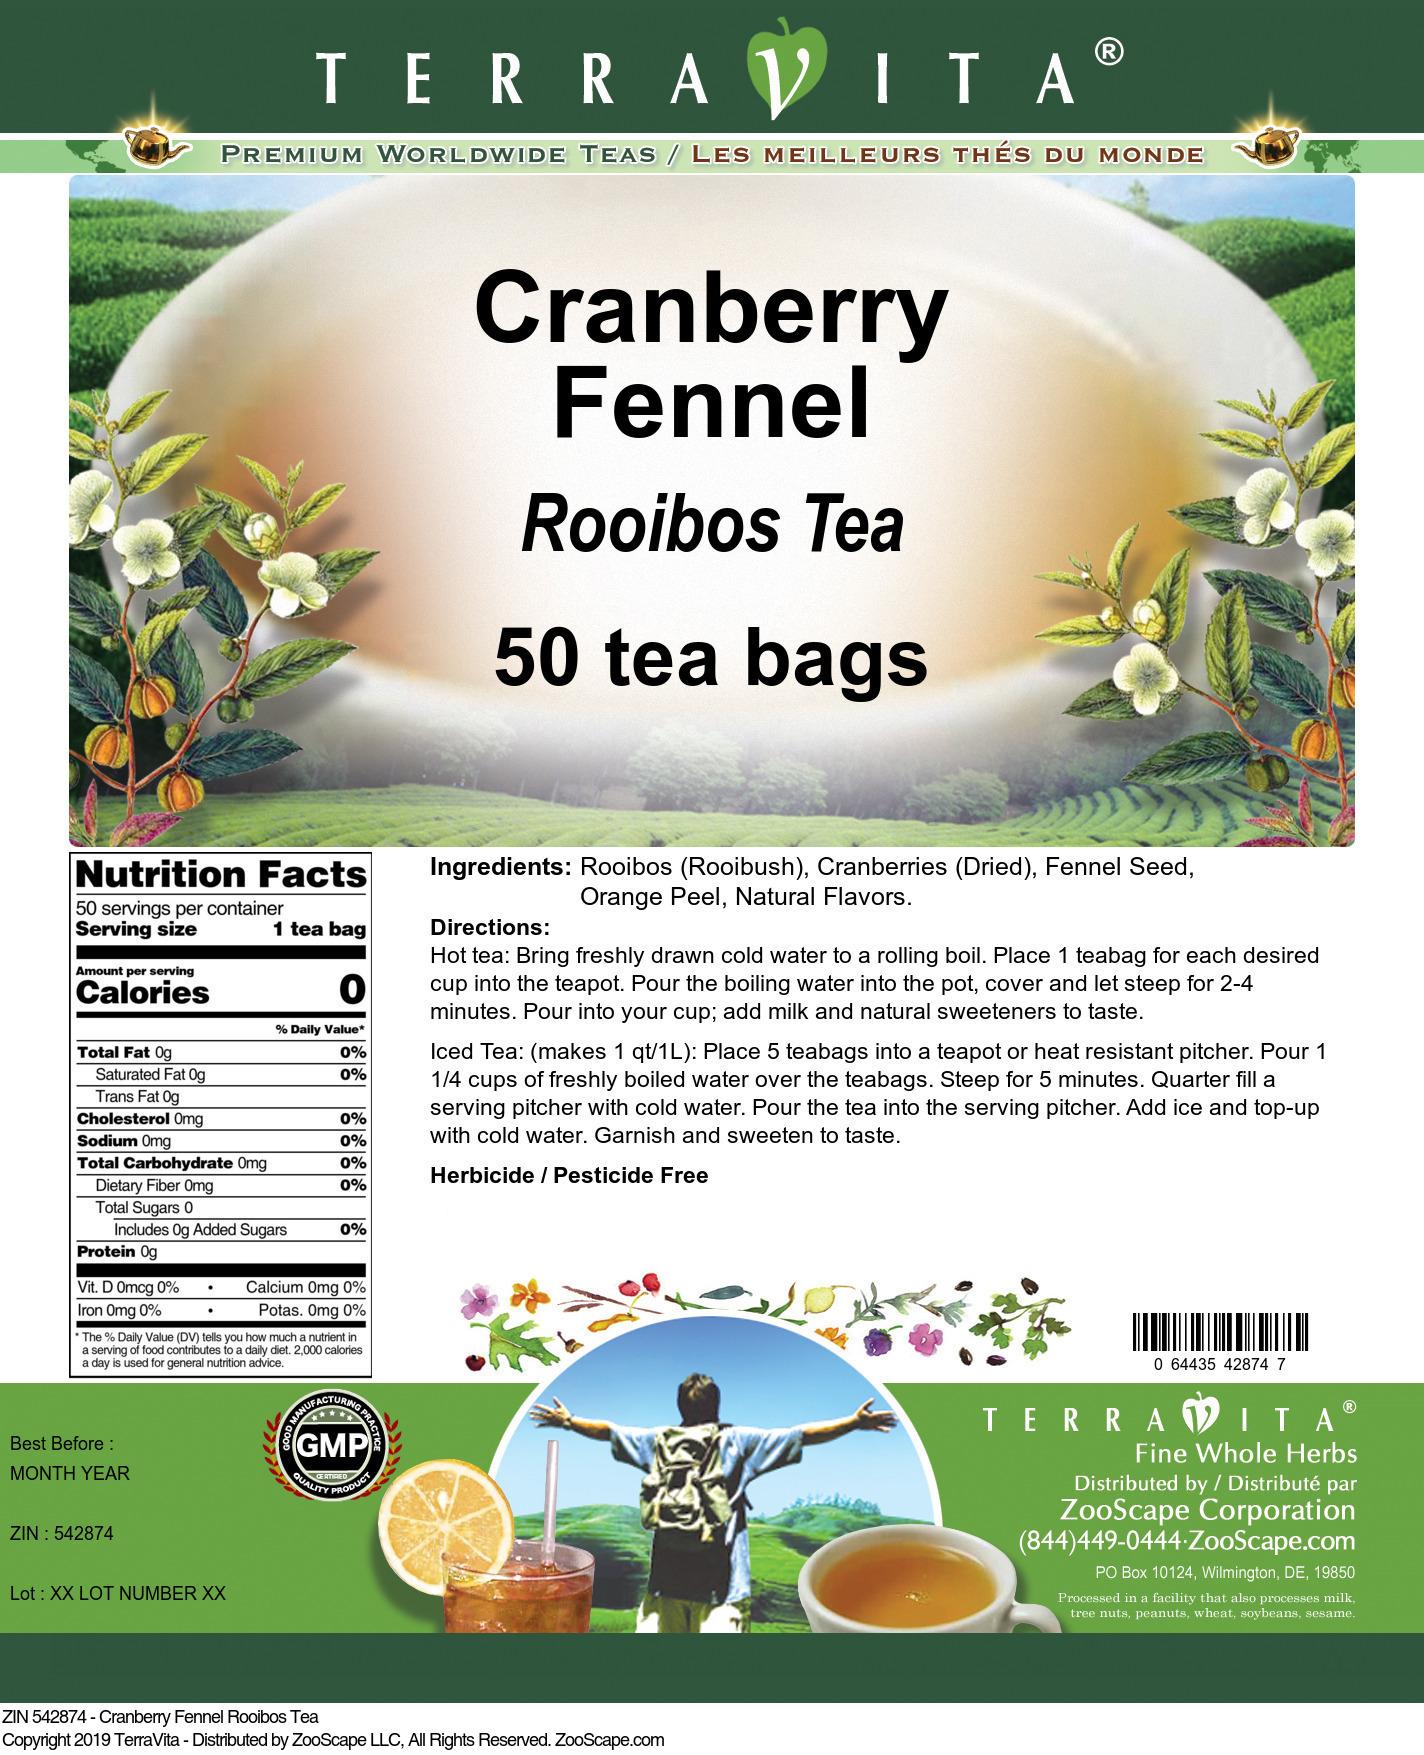 Cranberry Fennel Rooibos Tea